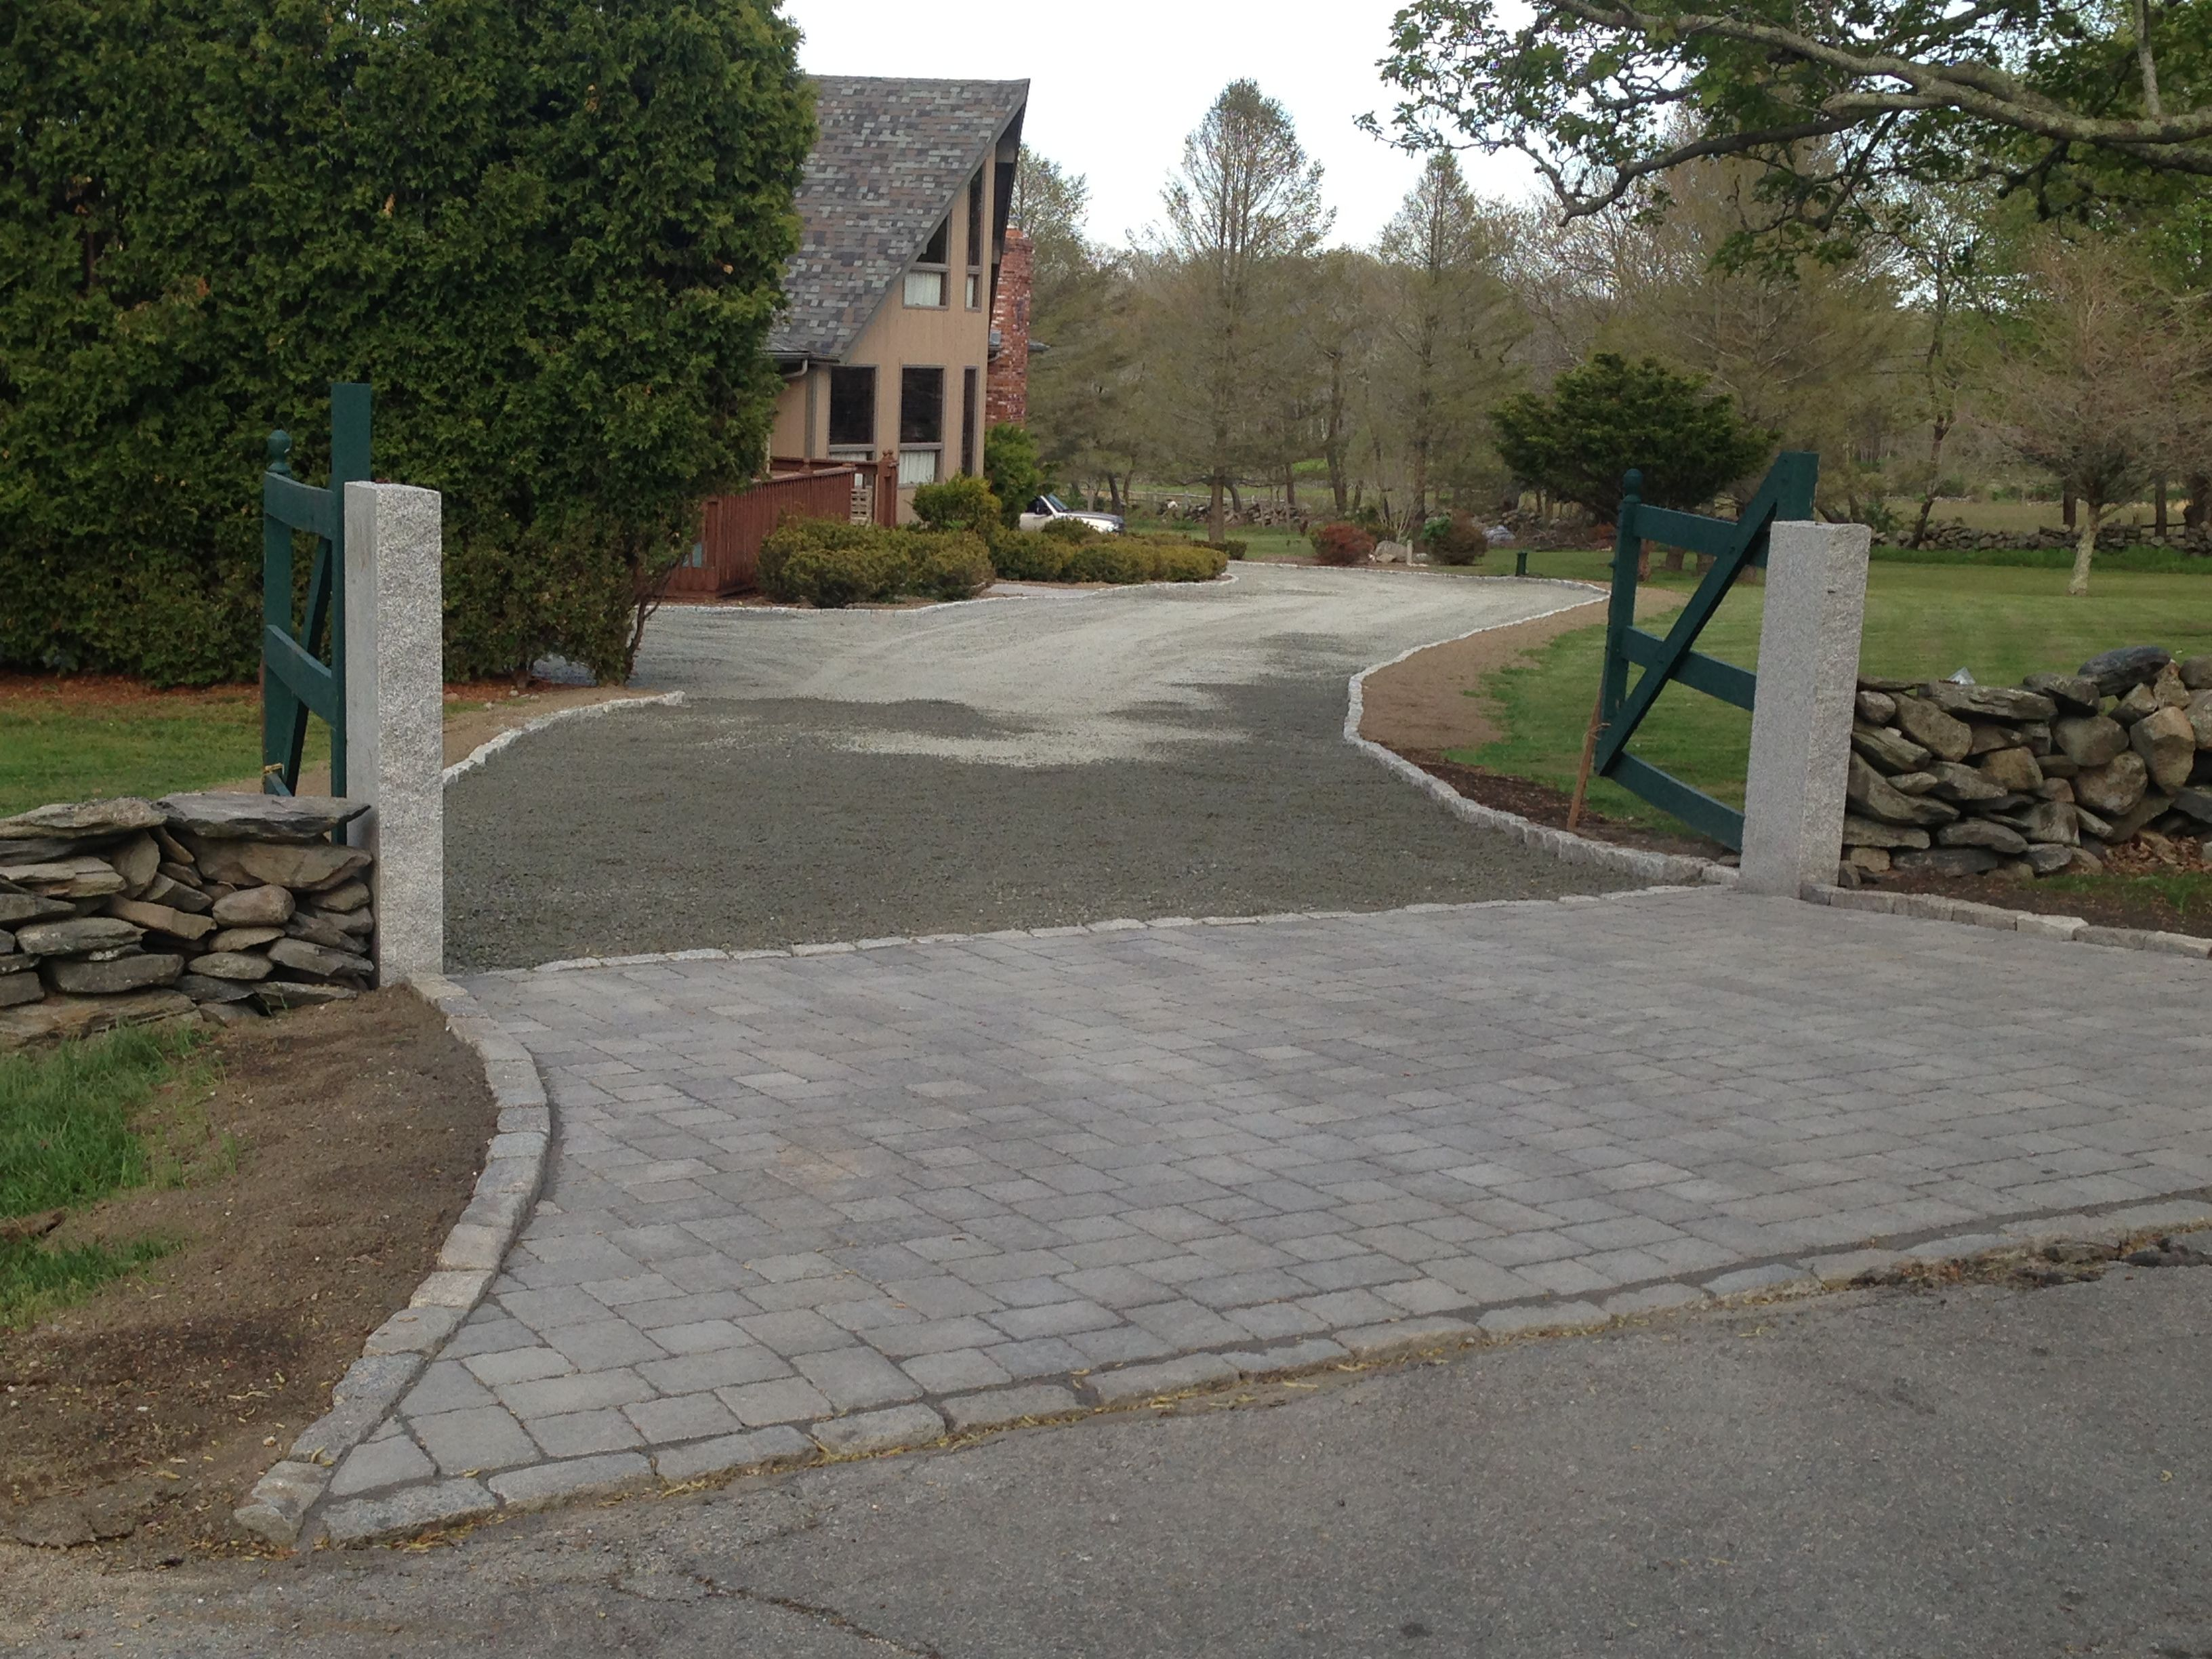 Pin By Susie B On Home Ideas Paver Driveway Driveway Apron Backyard Patio Designs